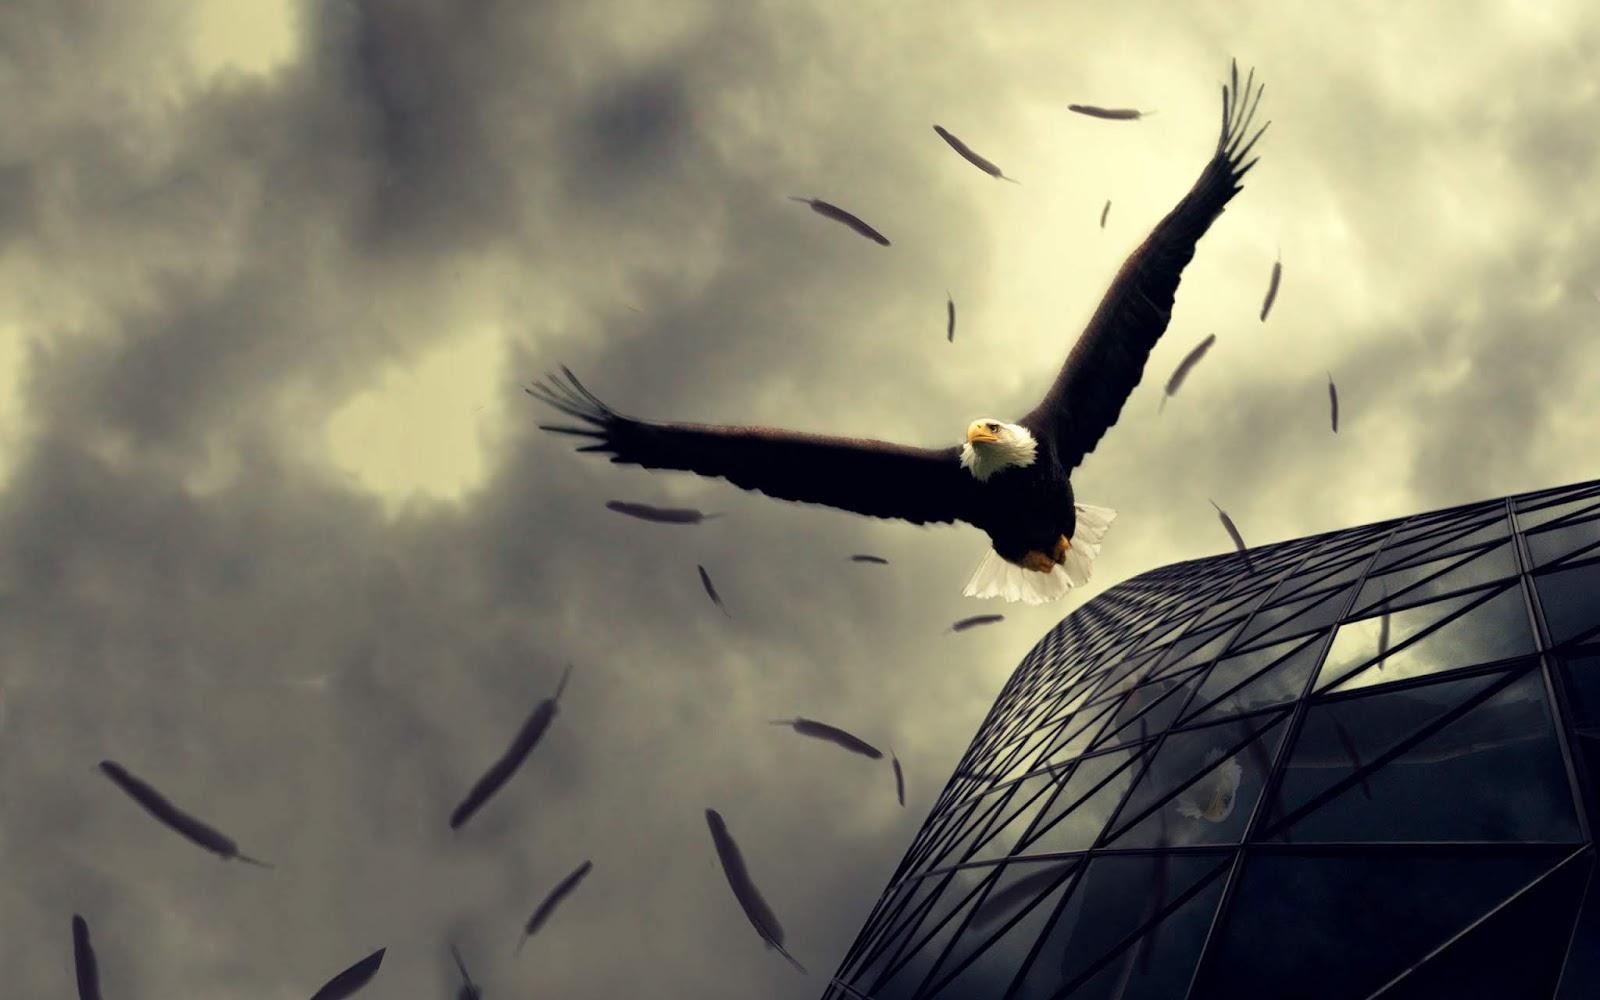 Eagle Wallpapers خلفية النسر 8k